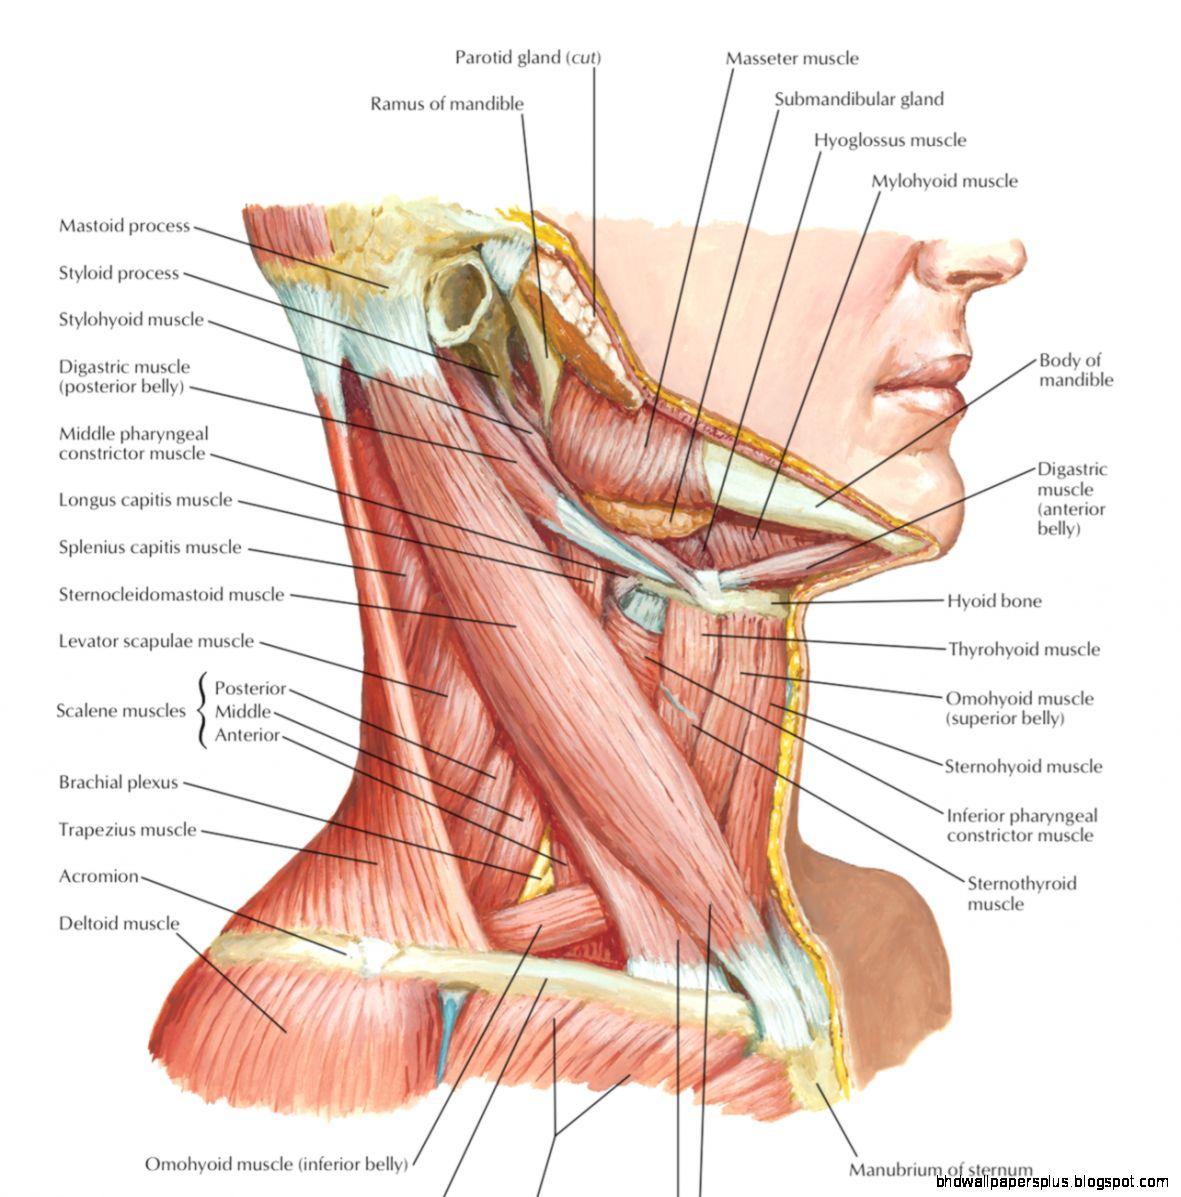 Netter Anatomy Hd Wallpapers Plus